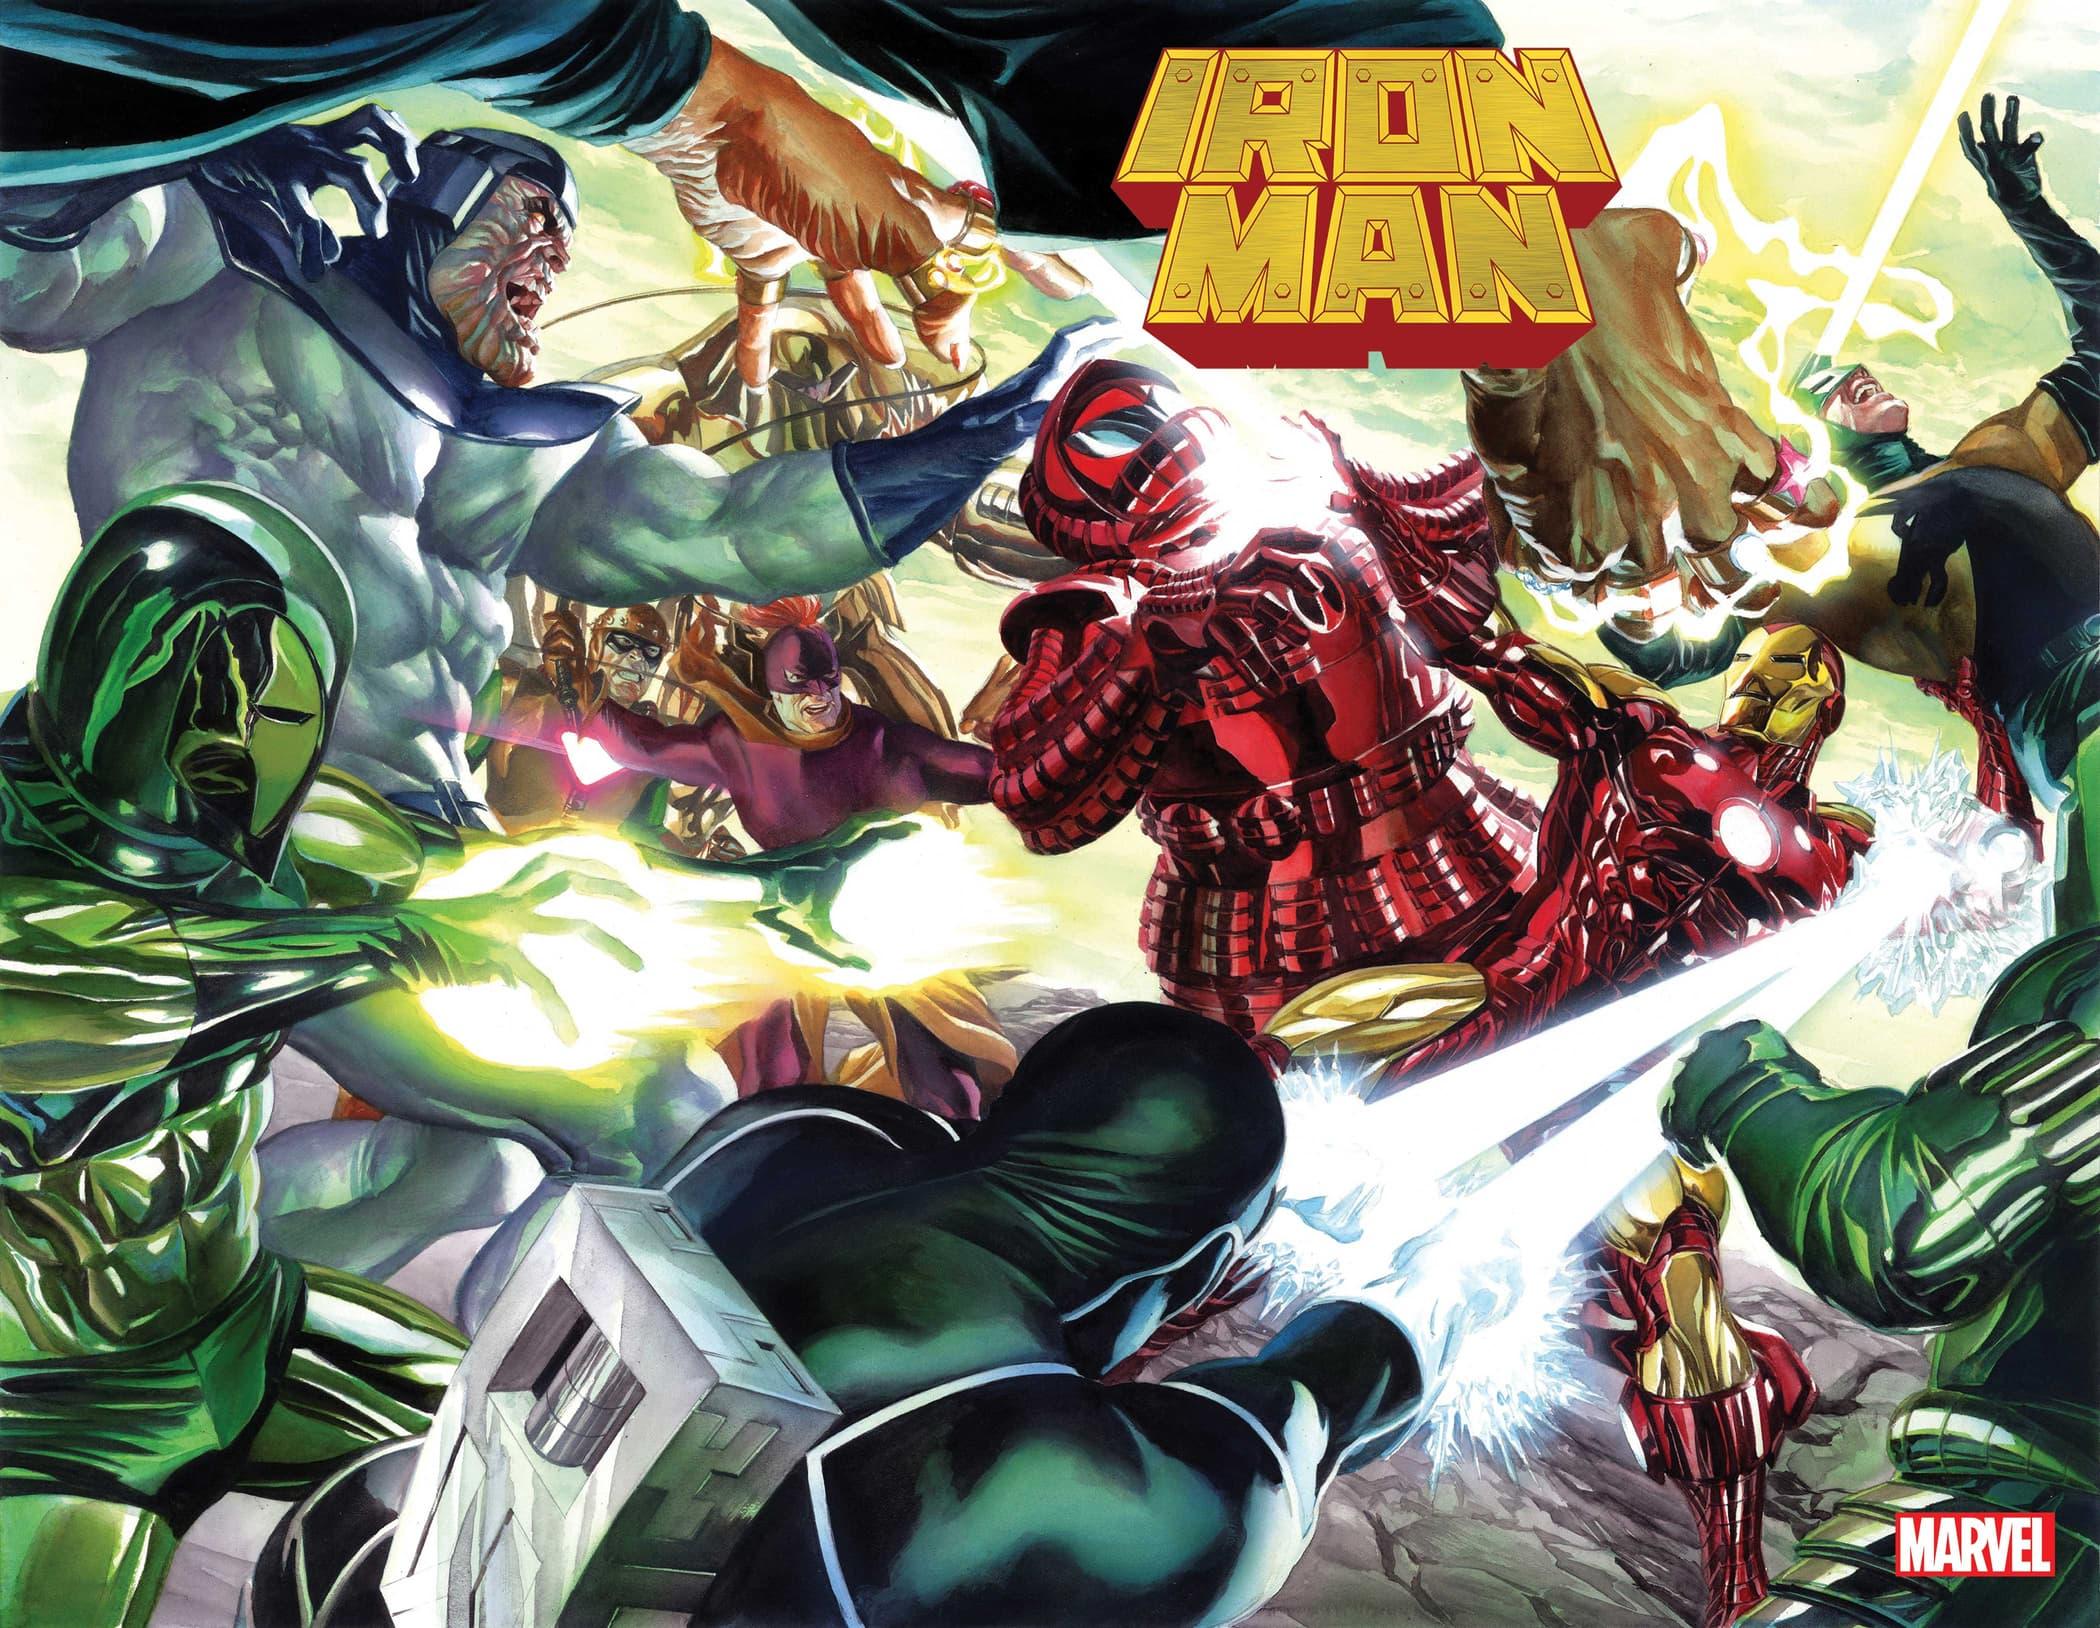 Iron Man #1 cover